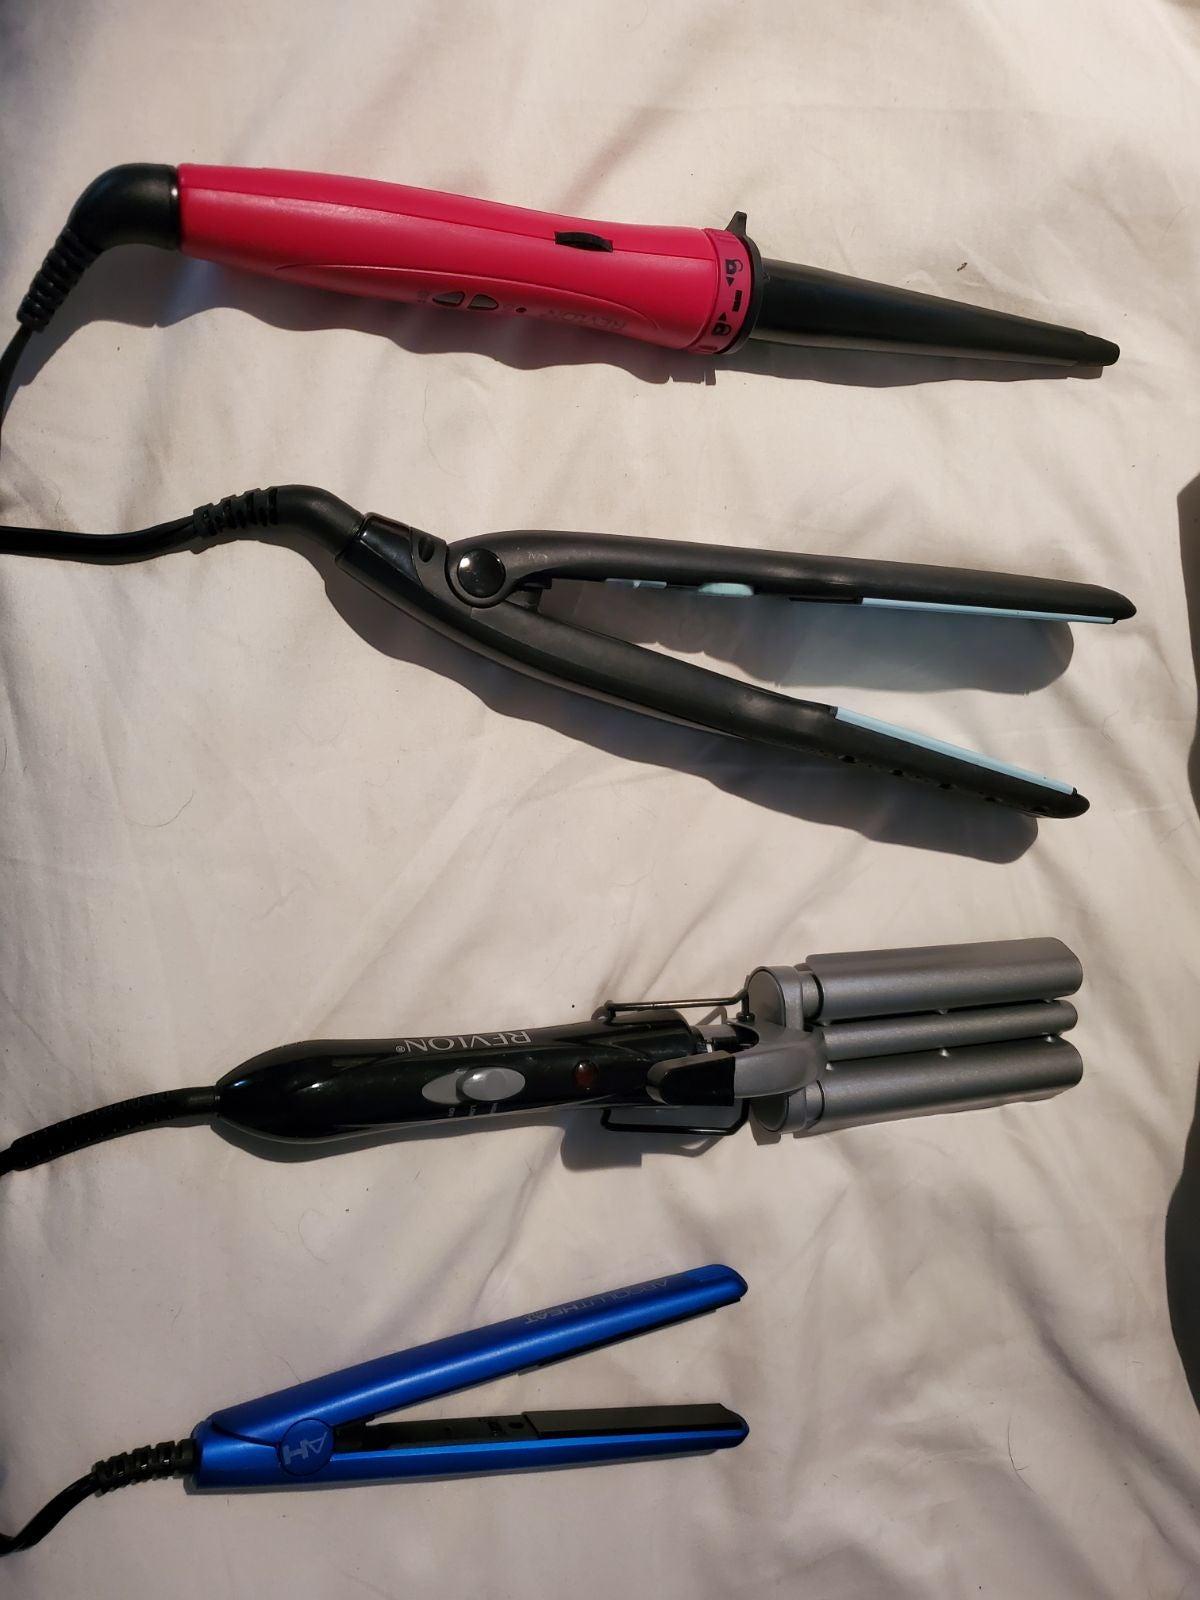 4 hair irons